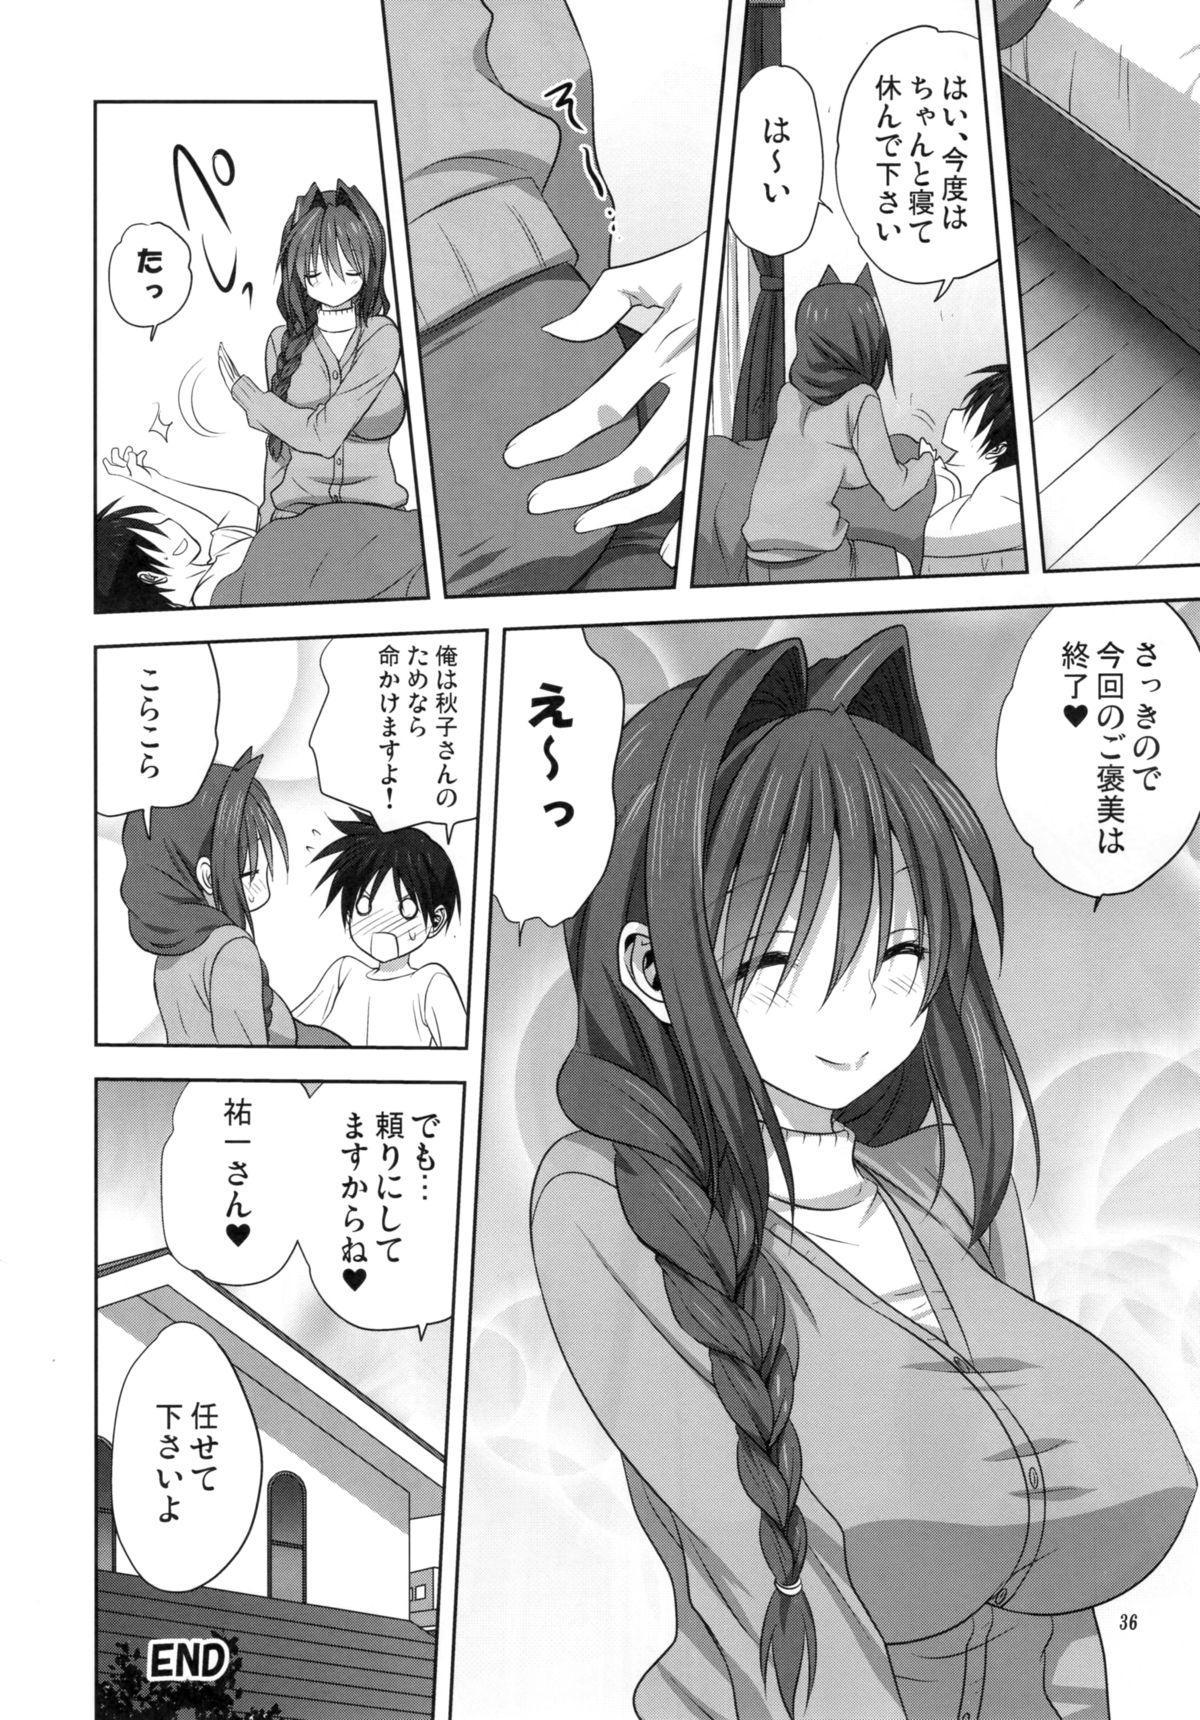 Akiko-san to Issho 16 34